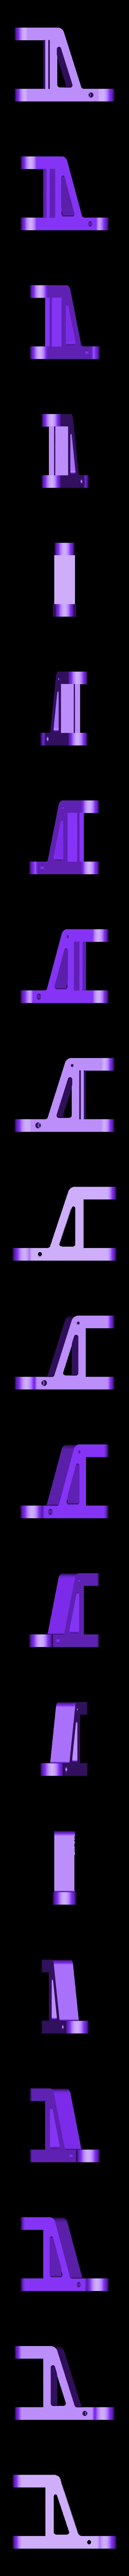 Arm1-_full.STL Download free STL file Stand Press. 2 in 1 • Object to 3D print, perinski